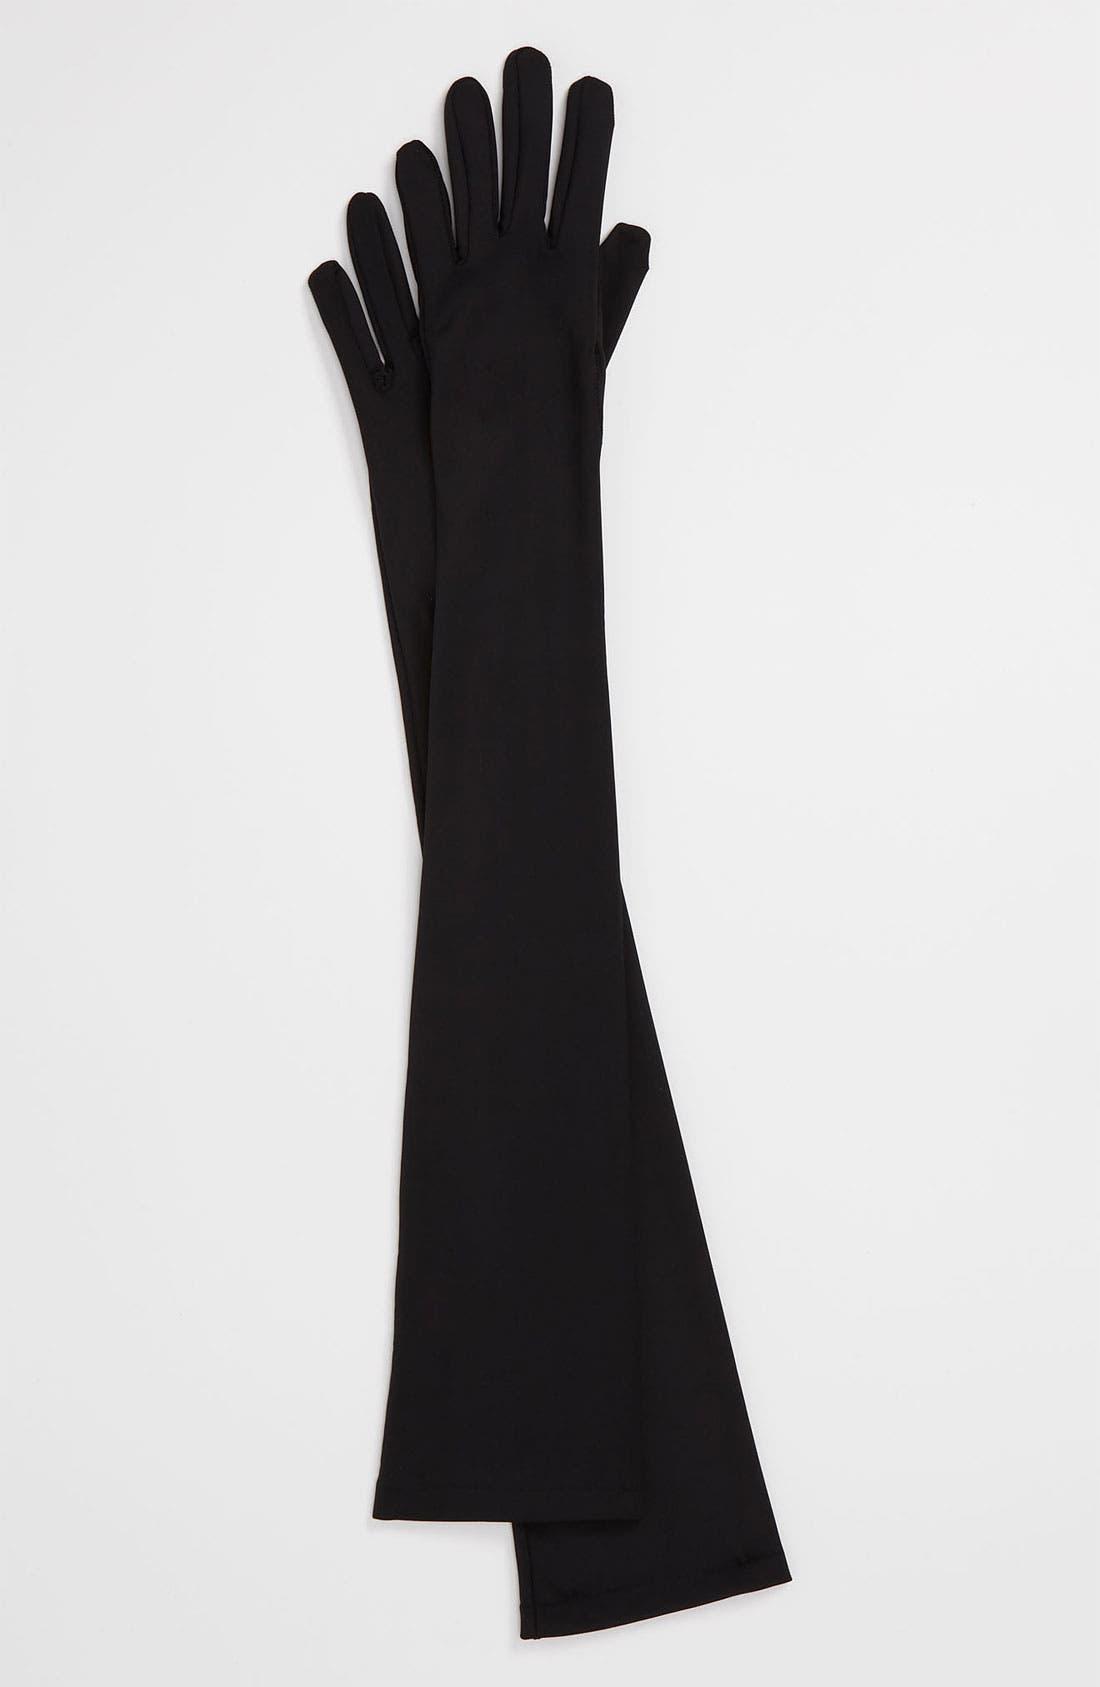 Main Image - Finale Opera Length Gloves